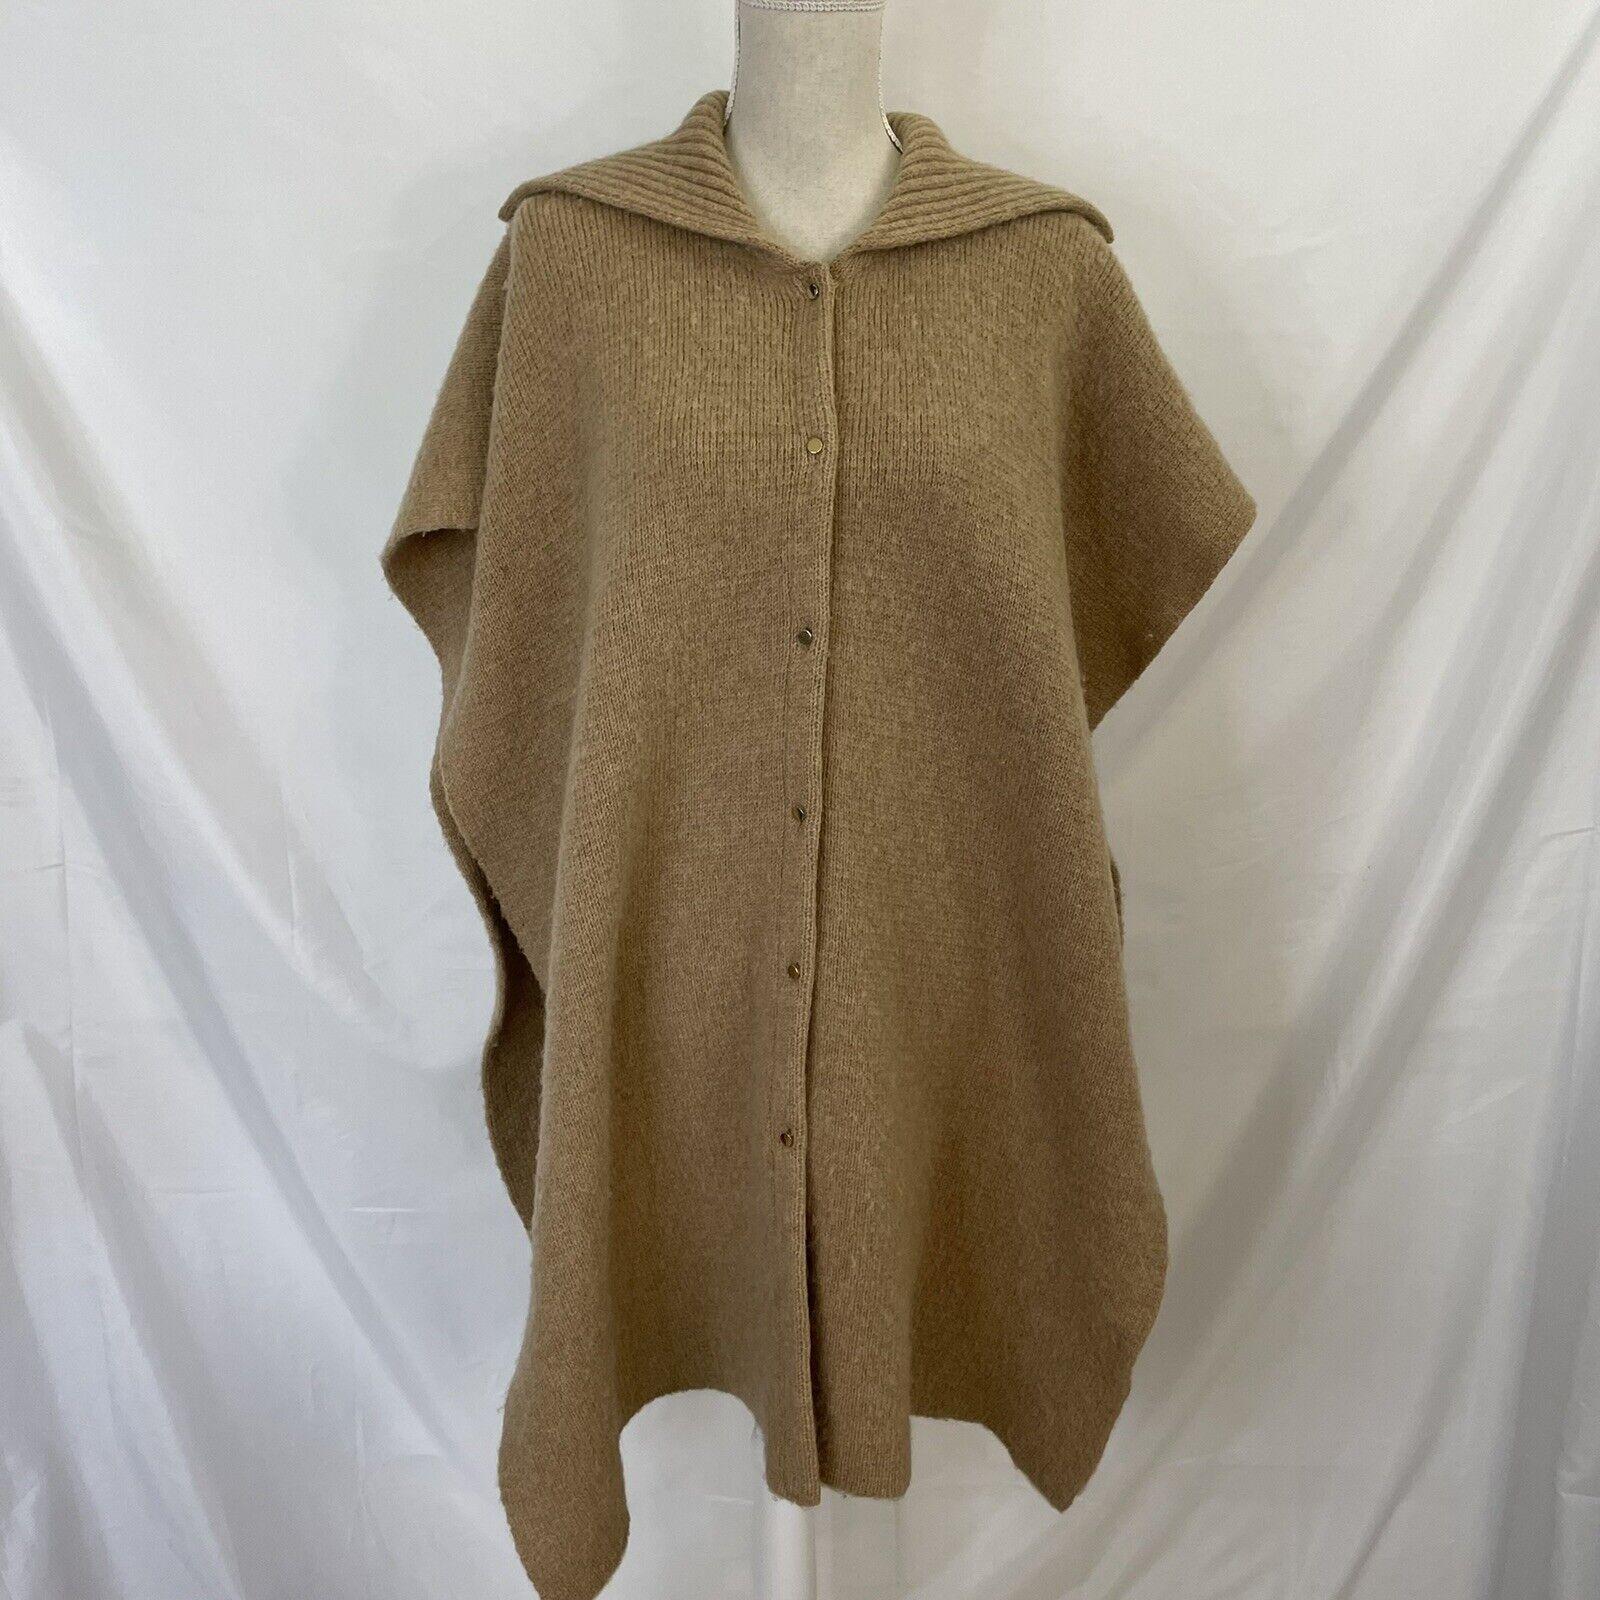 Bonnie Cashin Camel Knit Sweater Cape Poncho Coat - image 1